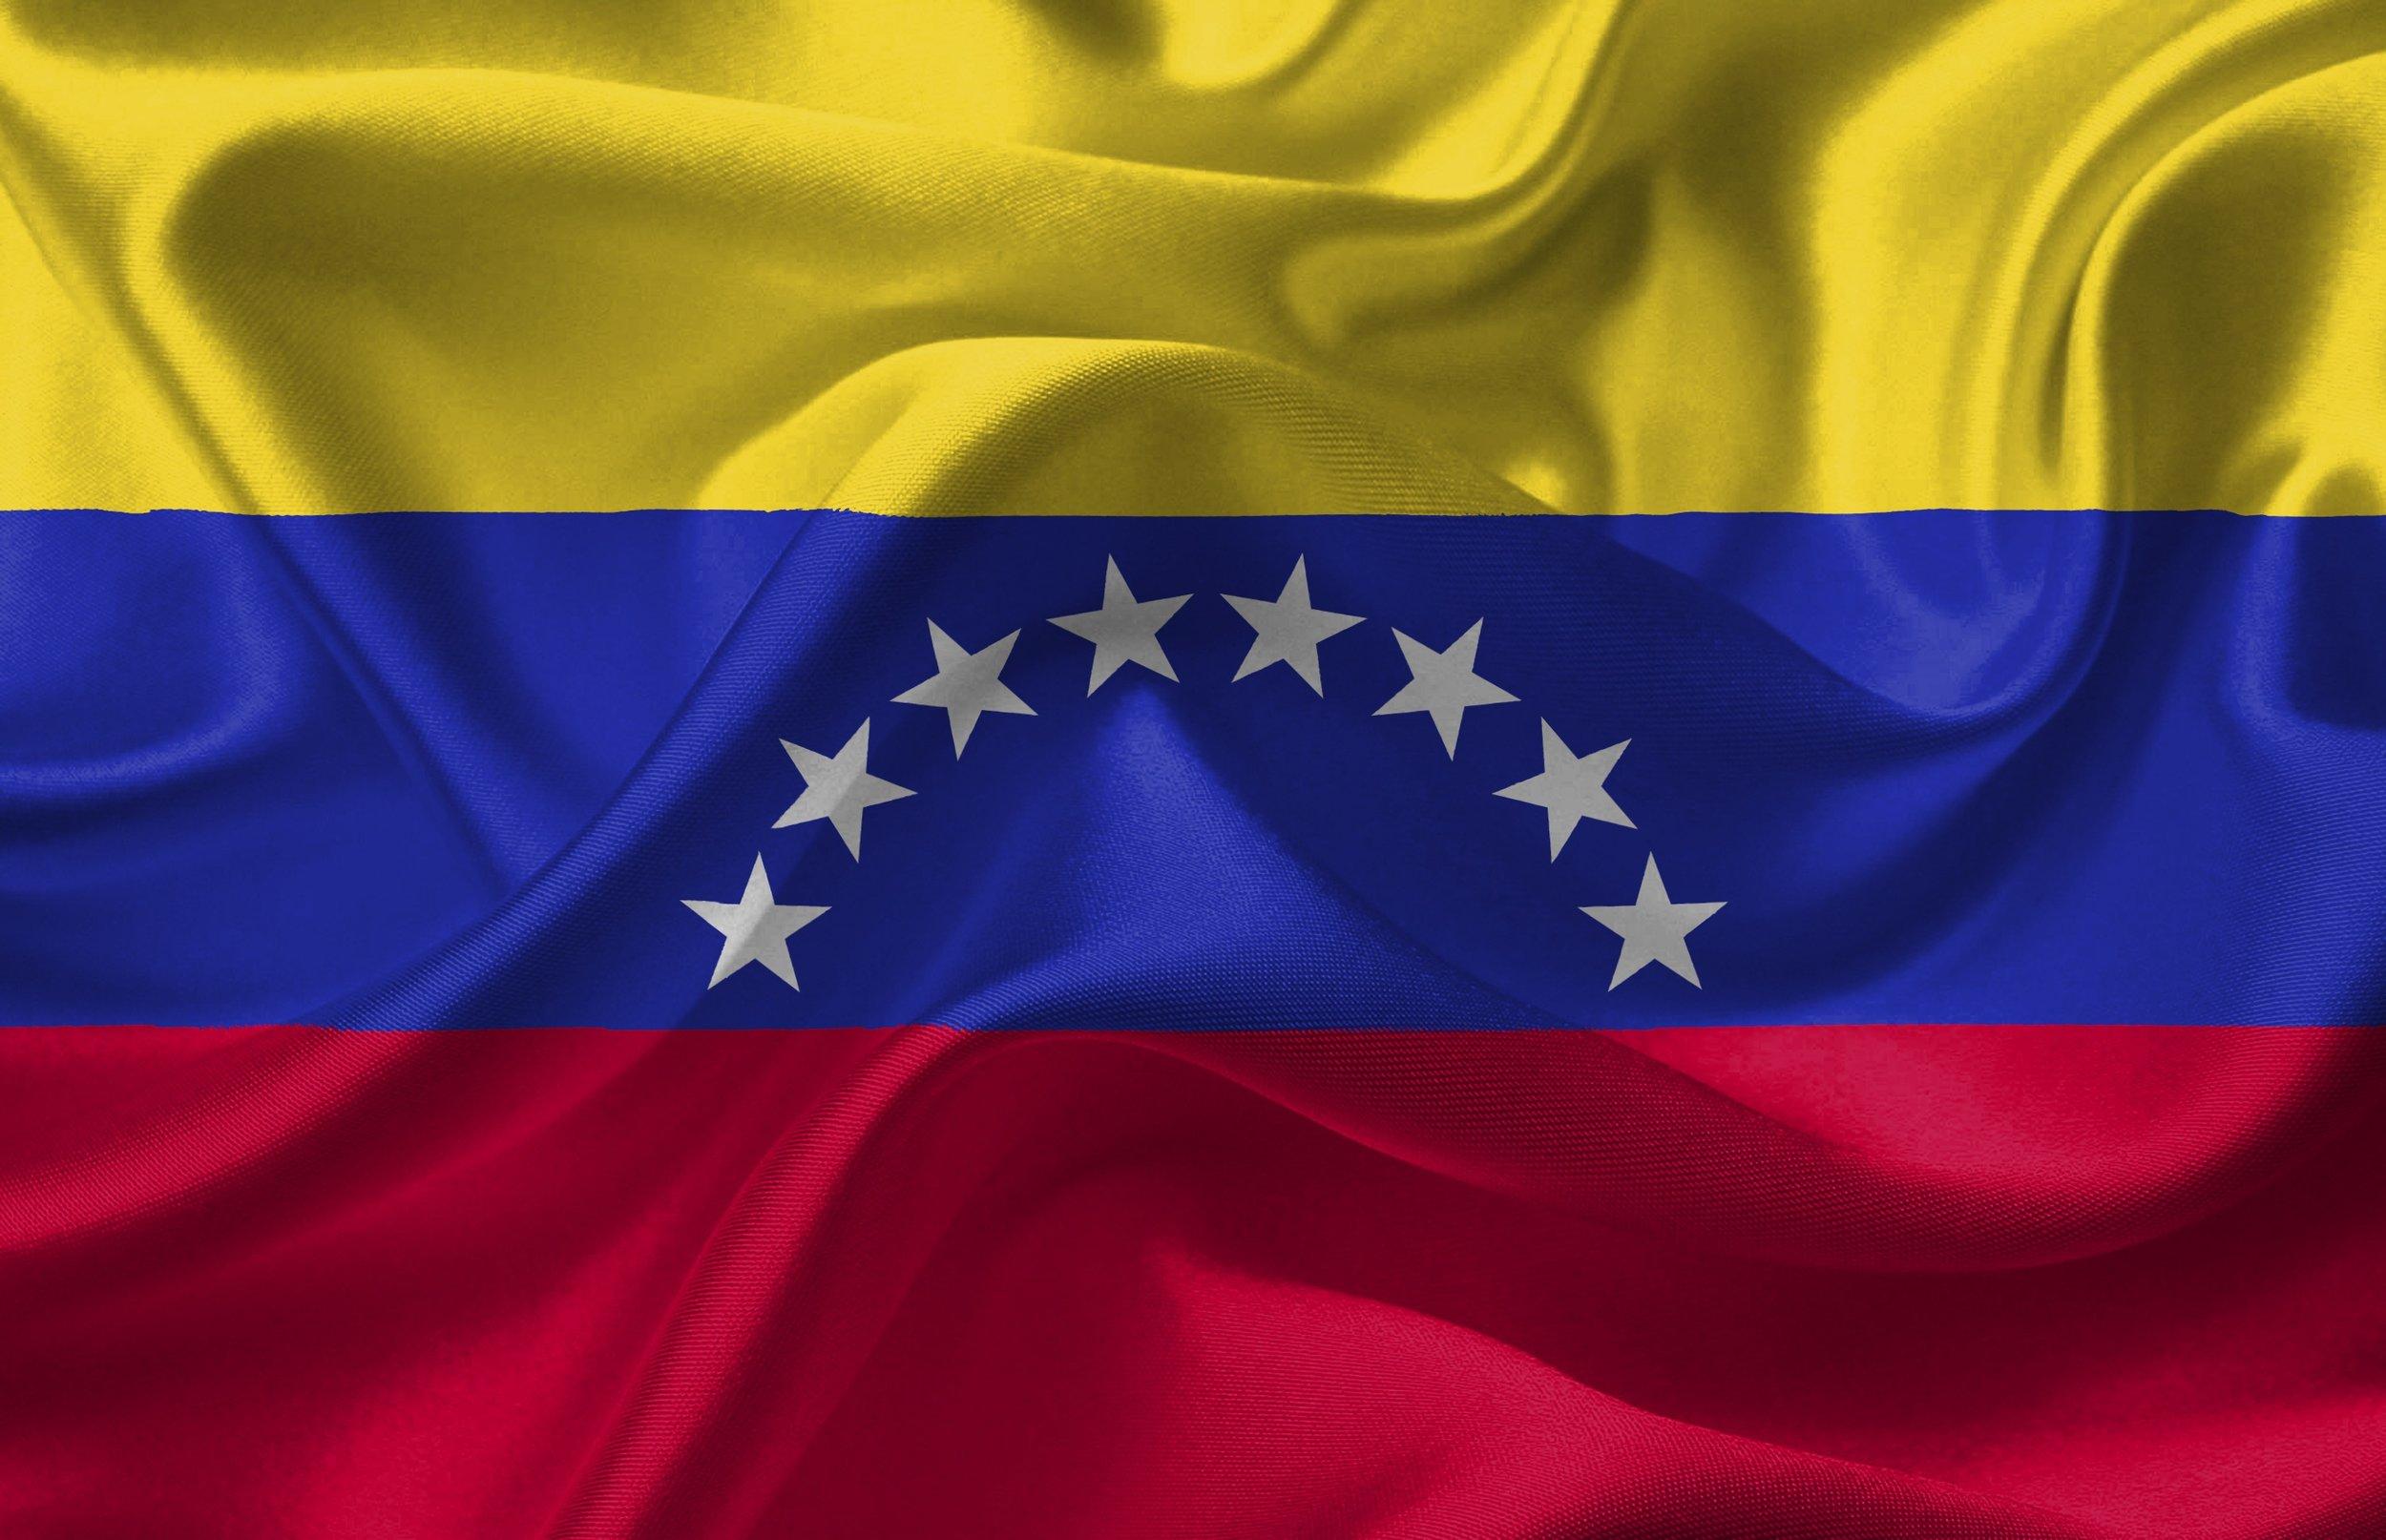 venezuela flag.jpg